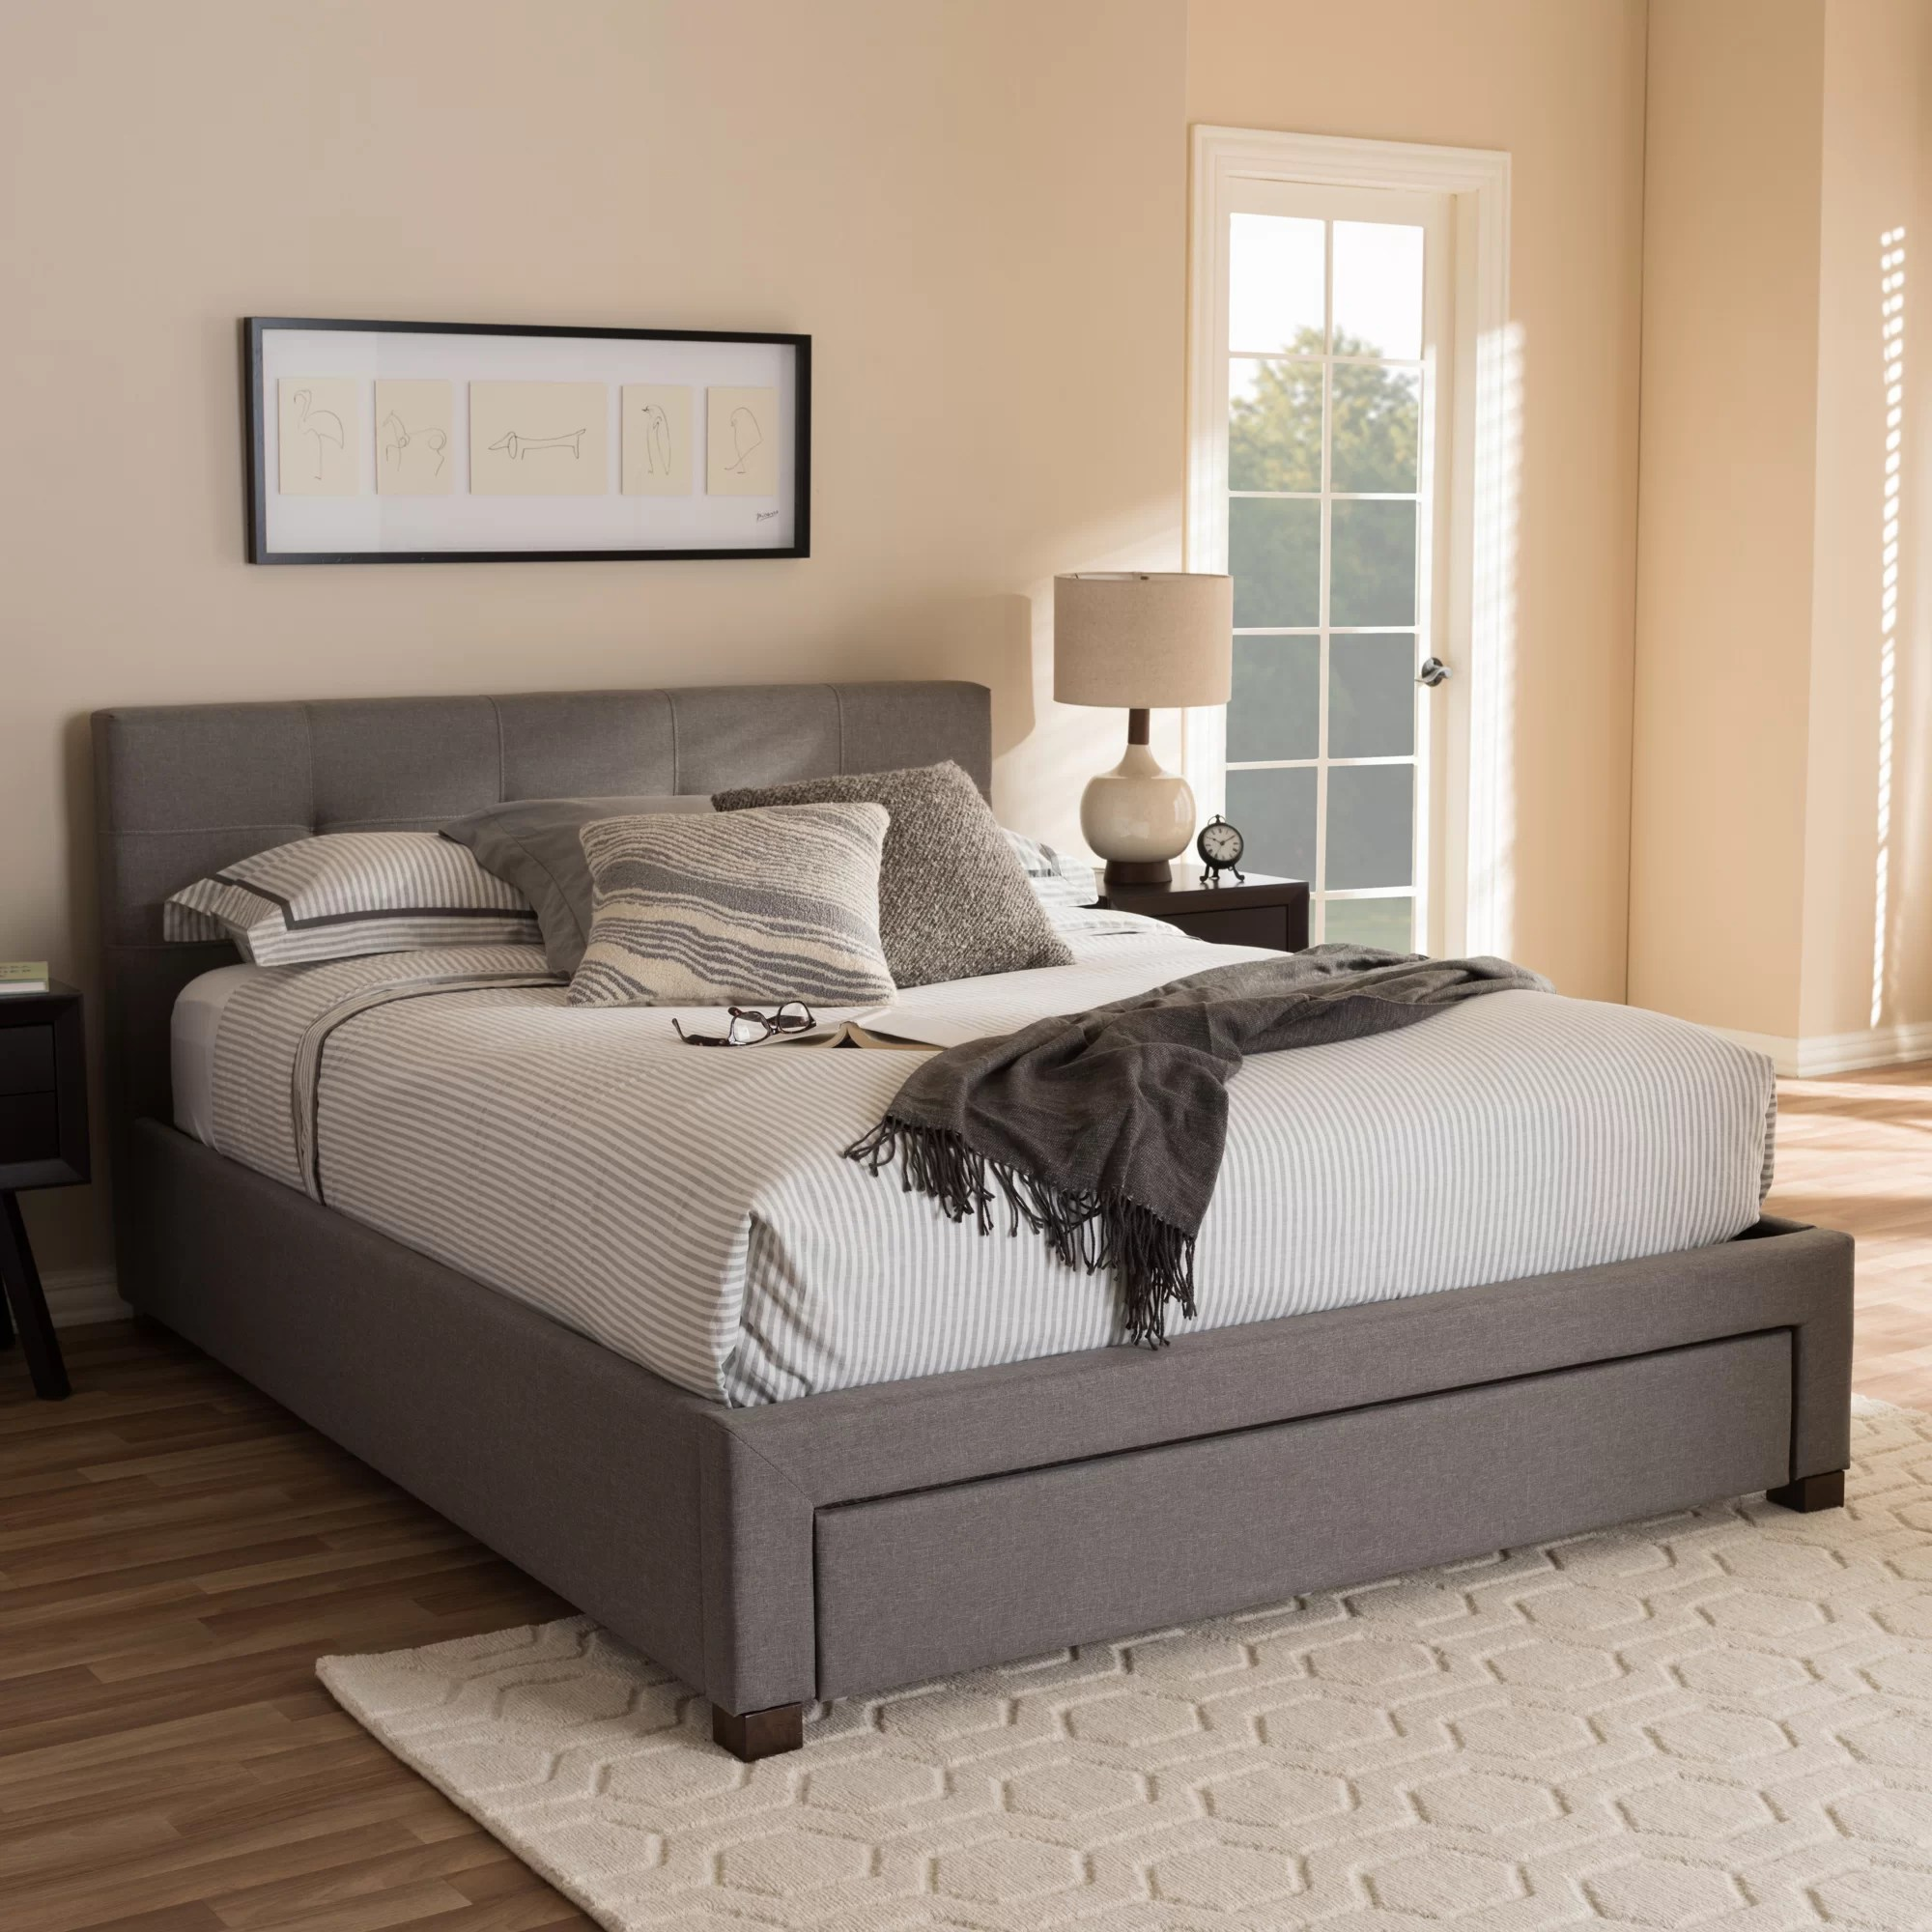 Wholesale Interiors Baxton Studio Upholstered Storage Platform Bed Amp Reviews Wayfair